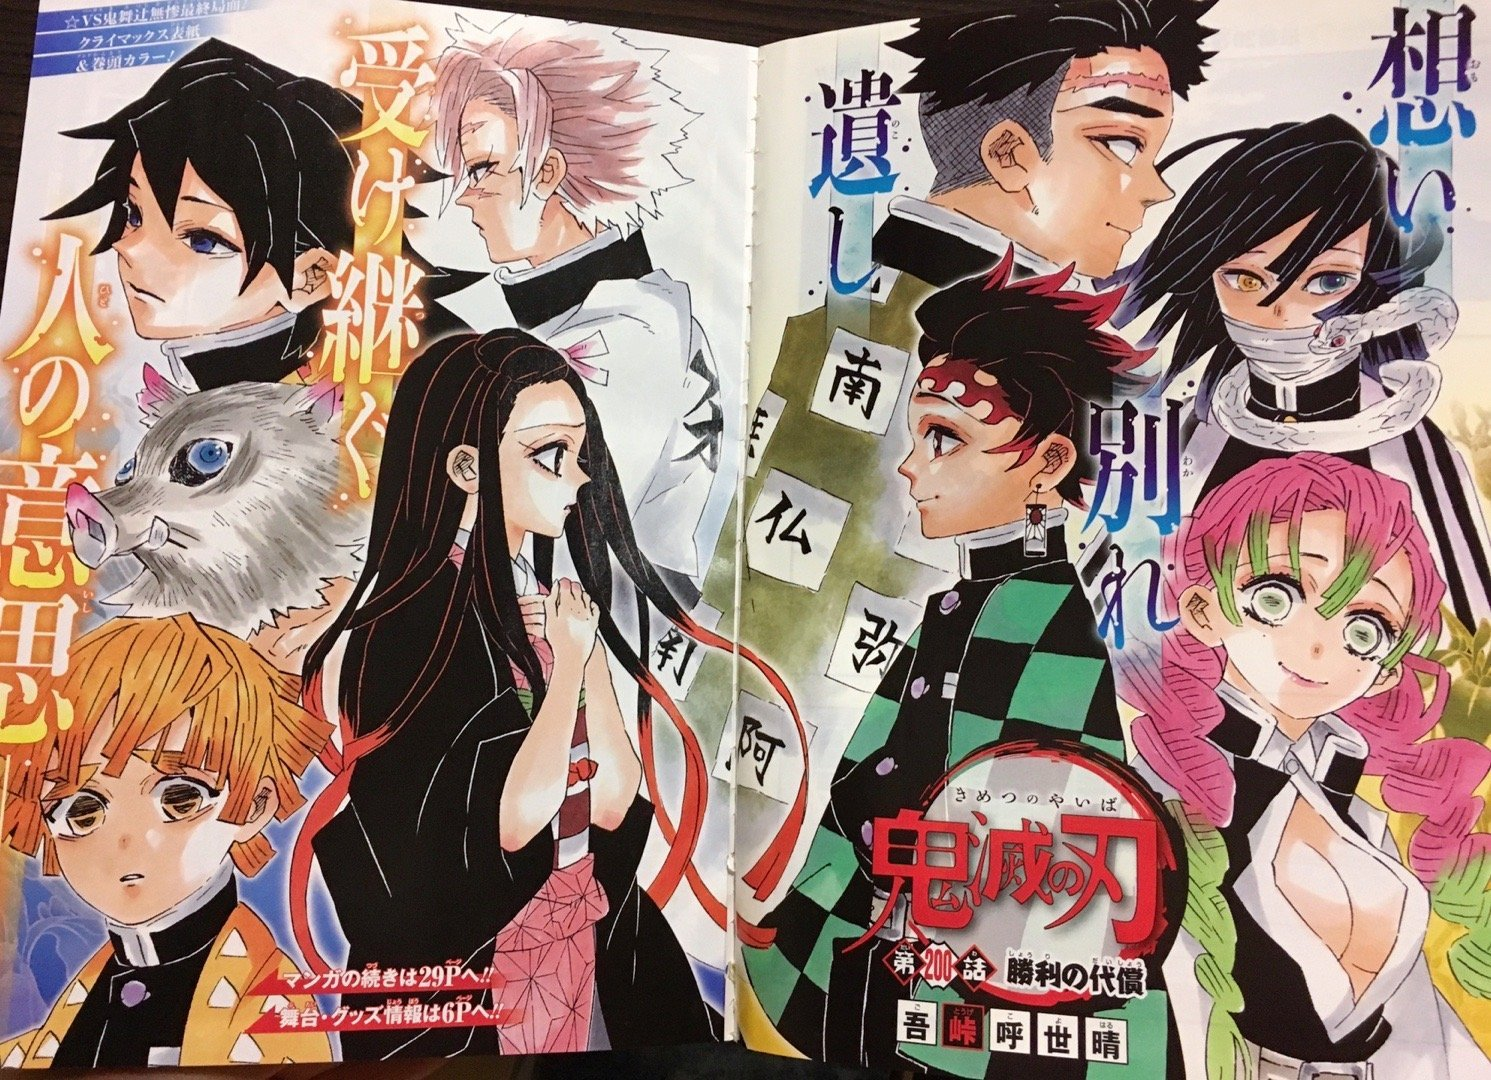 Kimetsu No Yaiba Chapter 200 Discussion Forums Myanimelist Net Mitsuri kanroji (甘 (かん) 露 (ろ) 寺 (じ) 蜜 (みつ) 璃 (り) kanroji mitsuri?) is a major supporting character of demon slayer: kimetsu no yaiba chapter 200 discussion